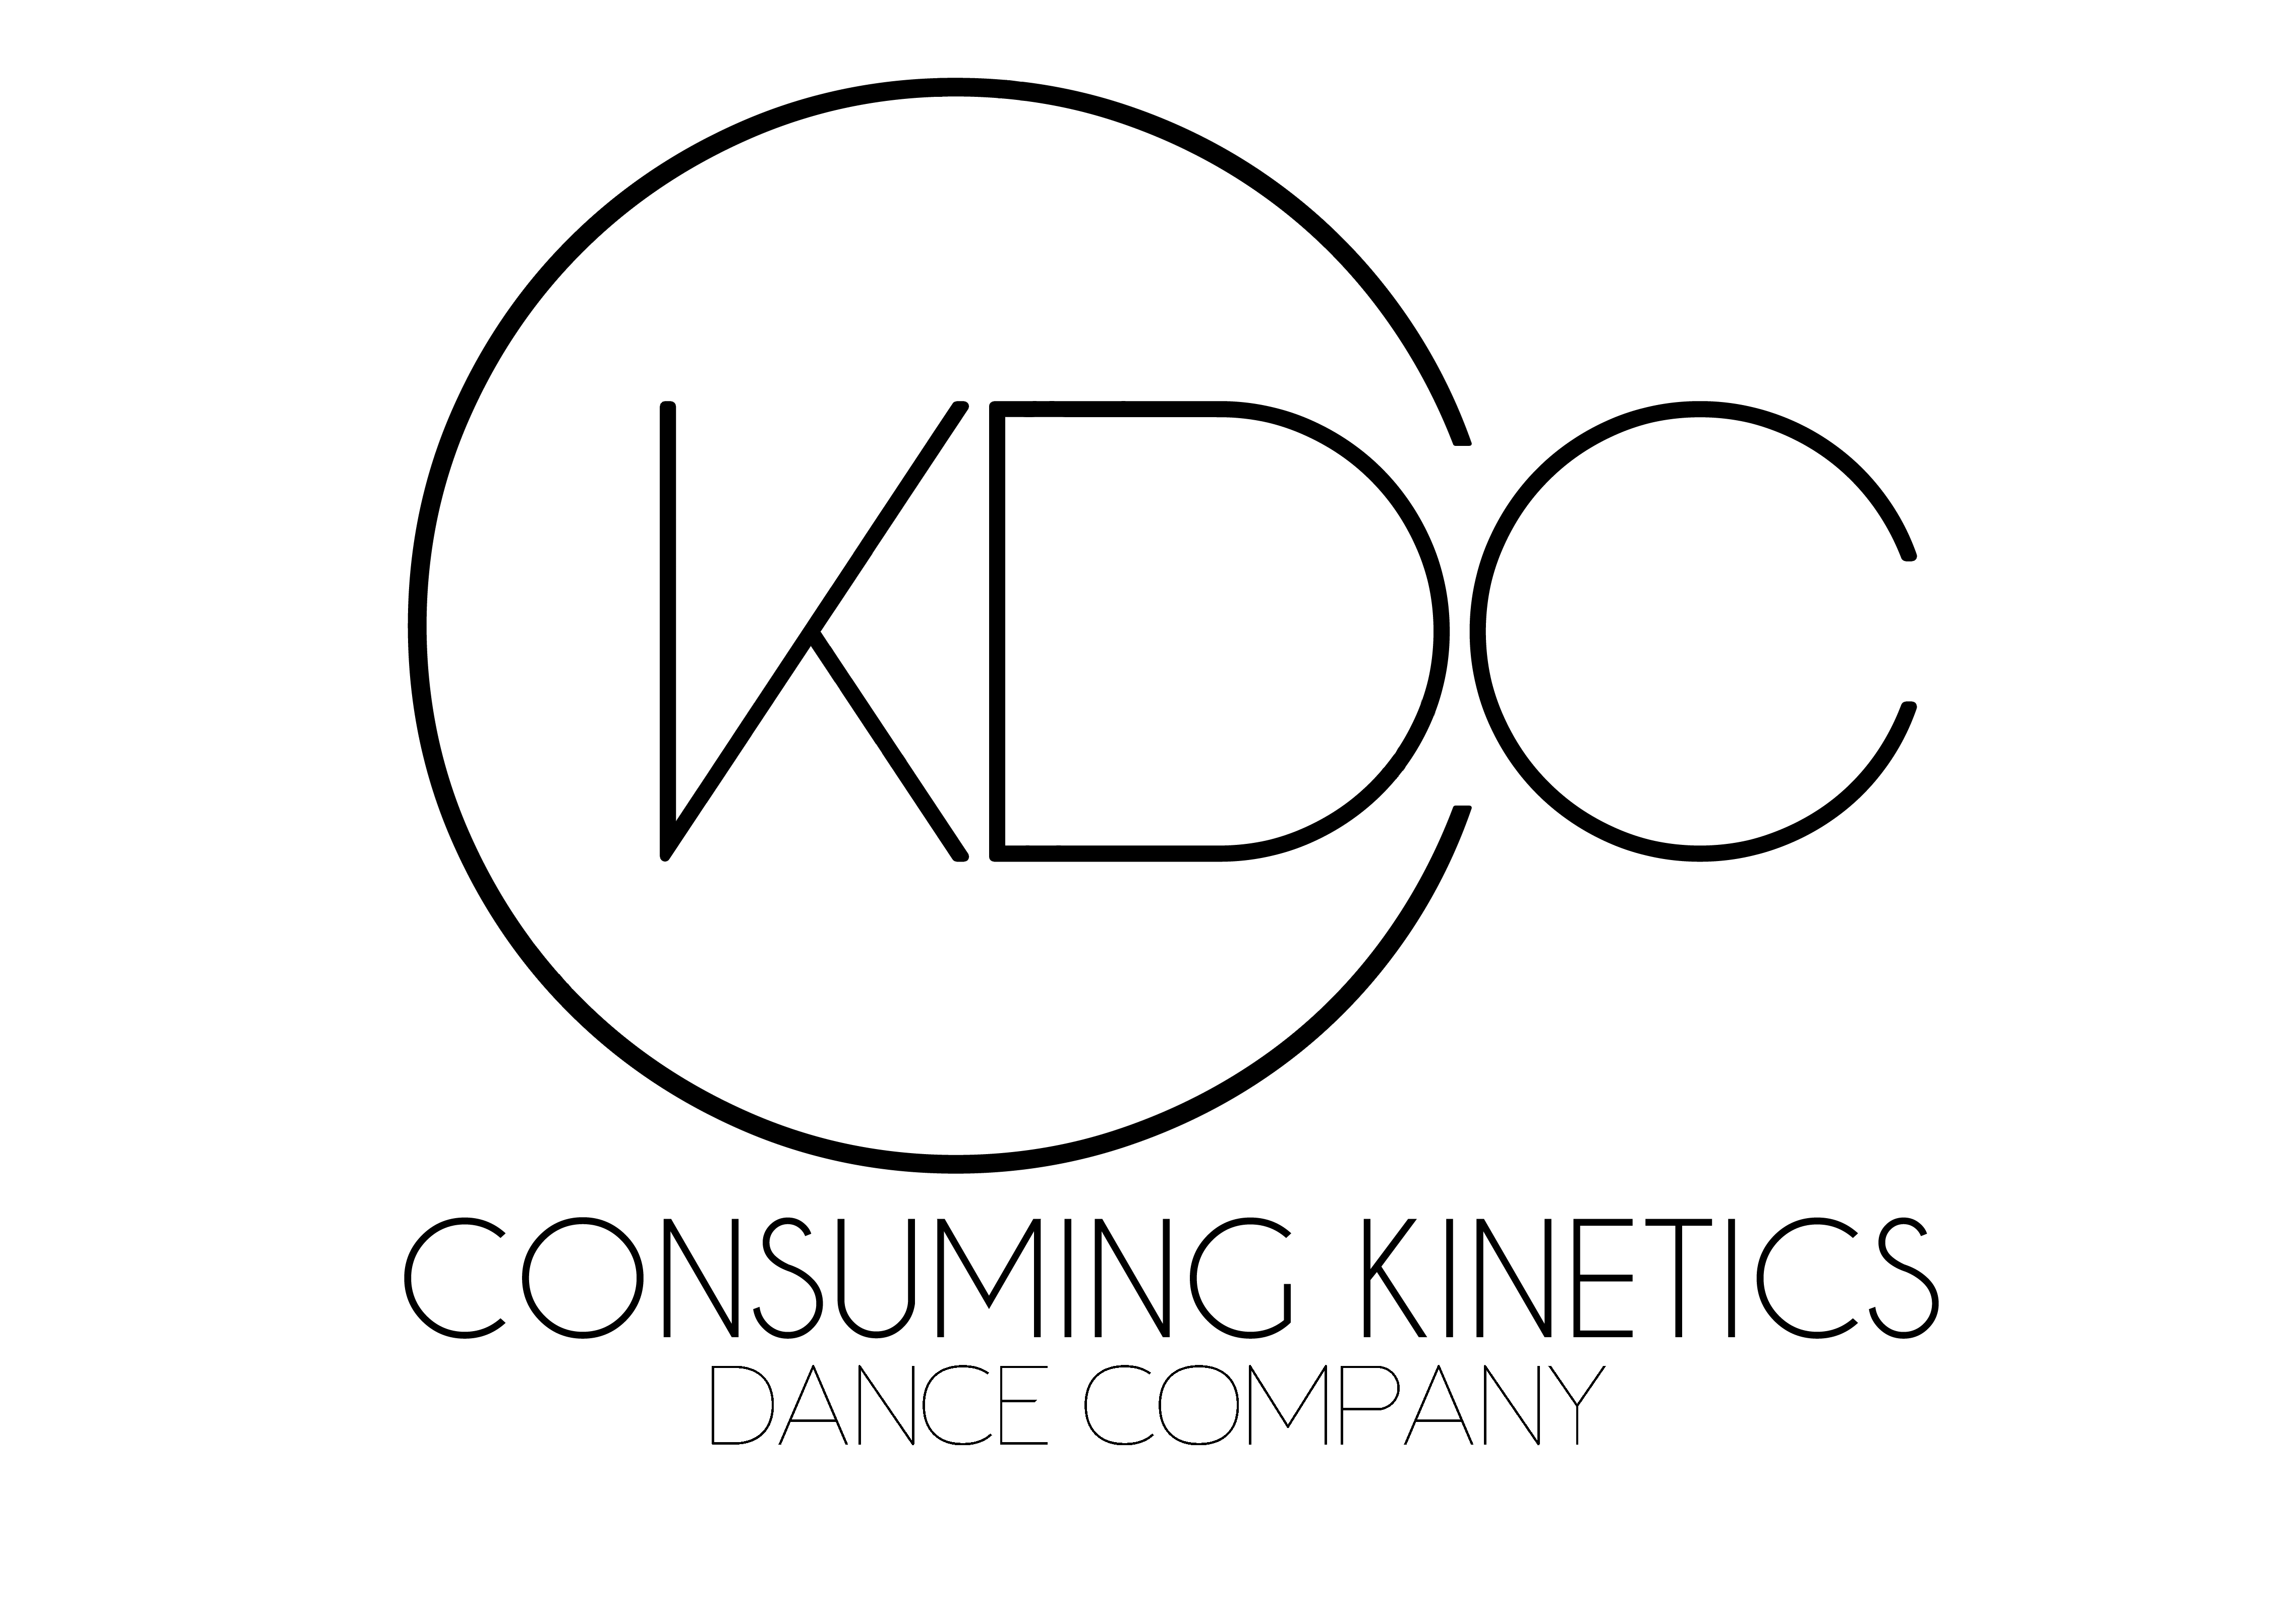 CKDC Logo